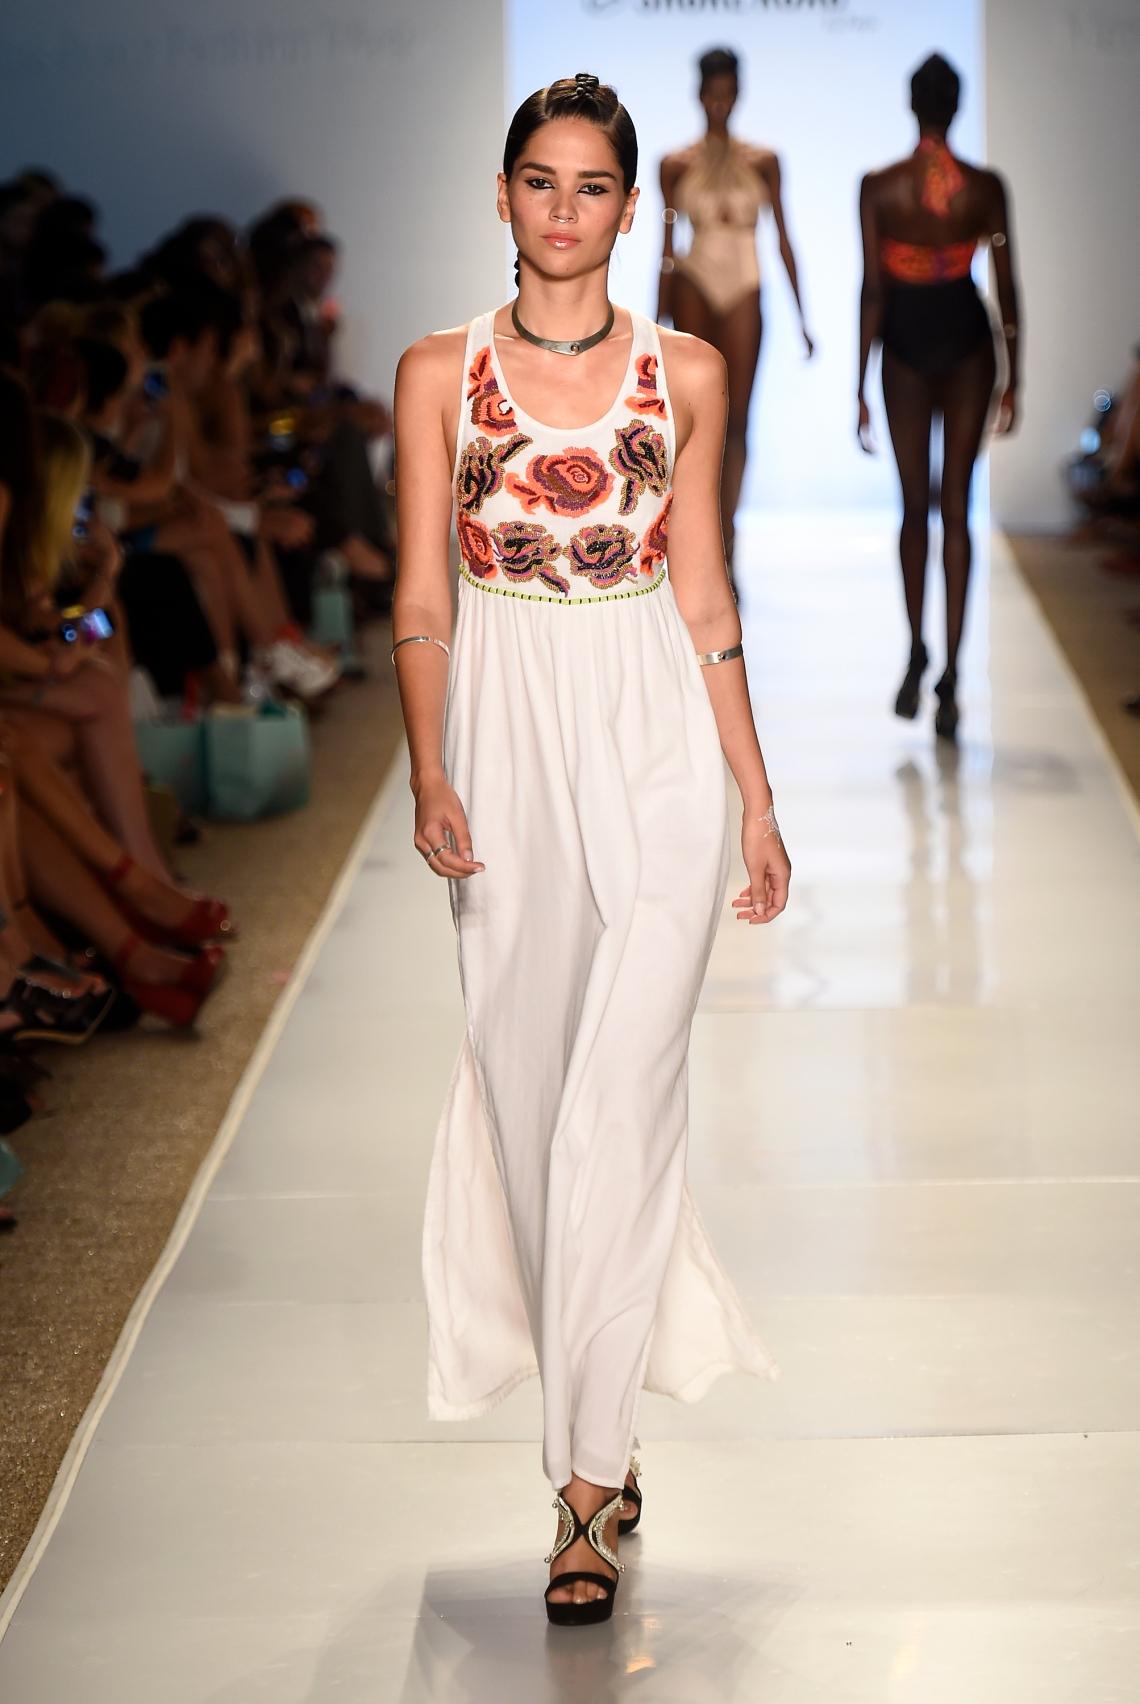 6 Shore Road by Pooja - Runway - Mercedes-Benz Fashion Week Swim 2015